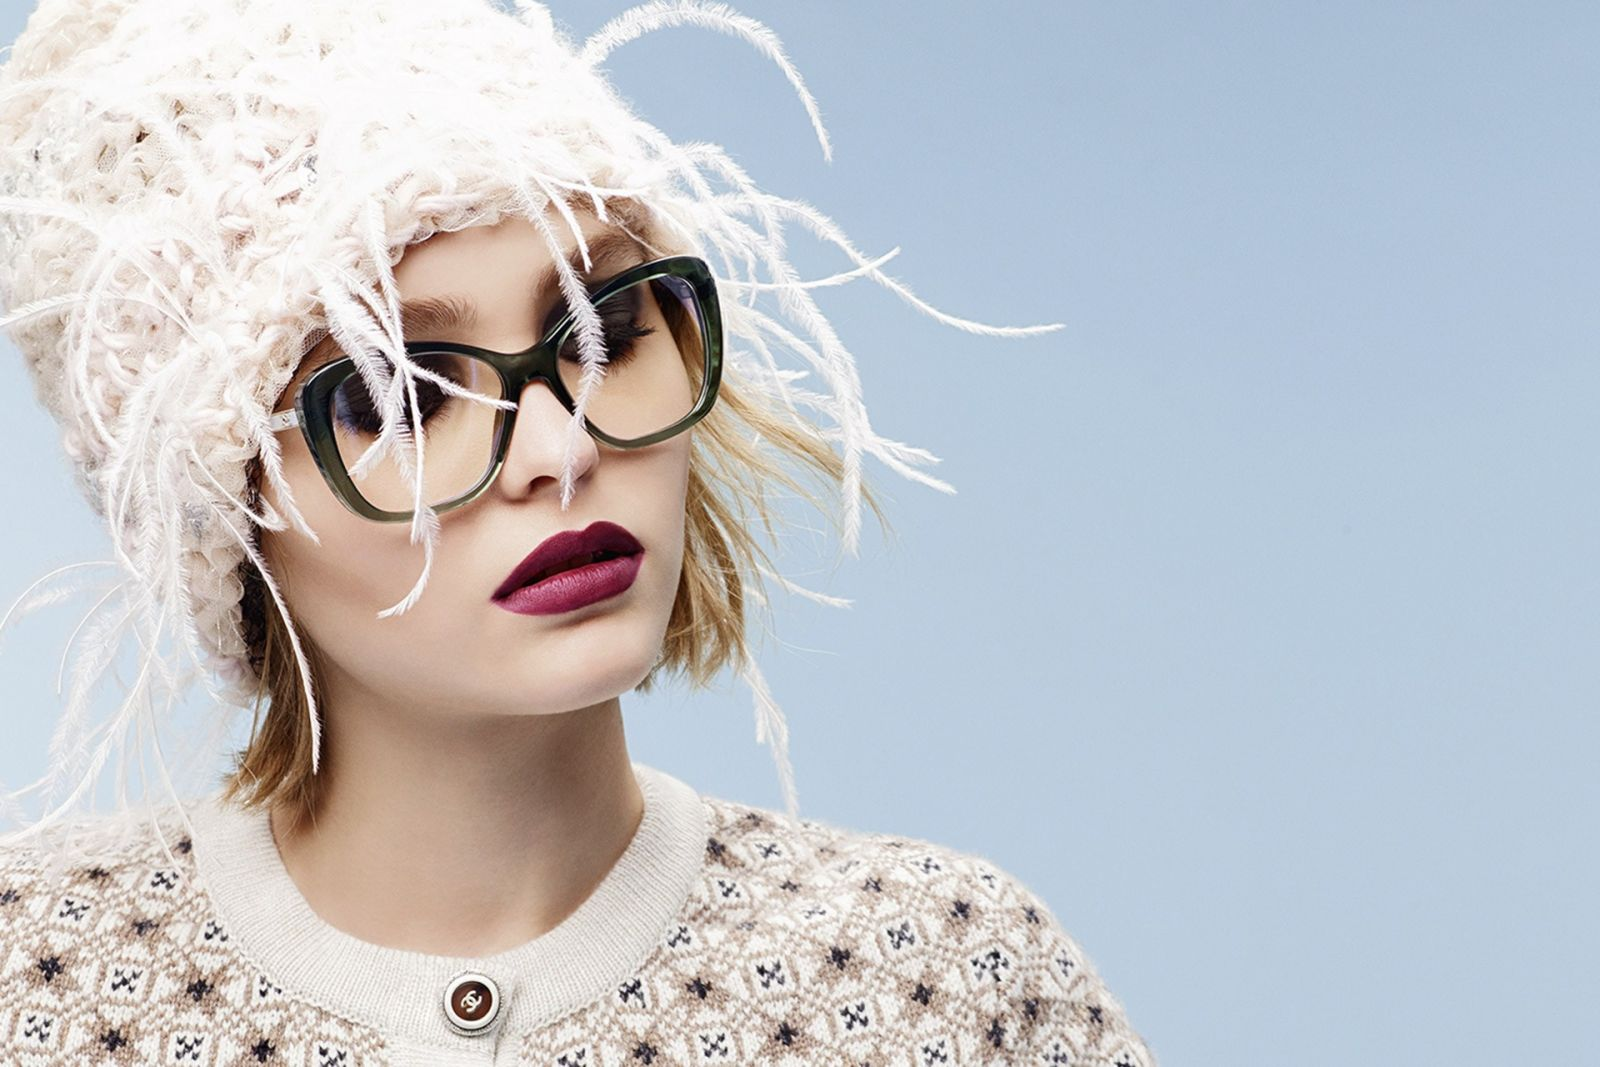 Лили-Роуз Депп в рекламе очков Chanel фото